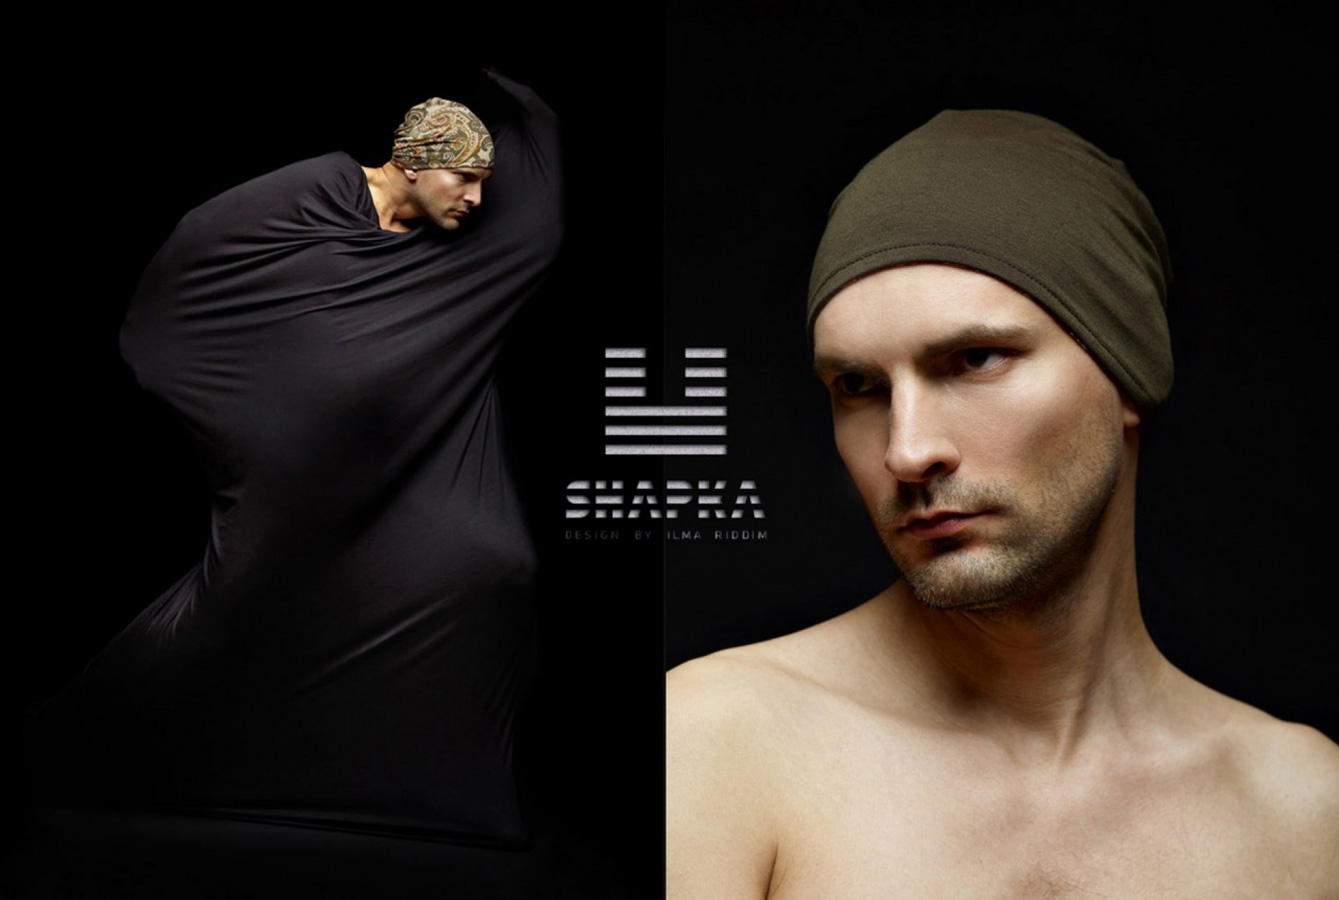 Shapka promo для Ilma Riddim. Рекламная съемка, фотограф Лена Волкова